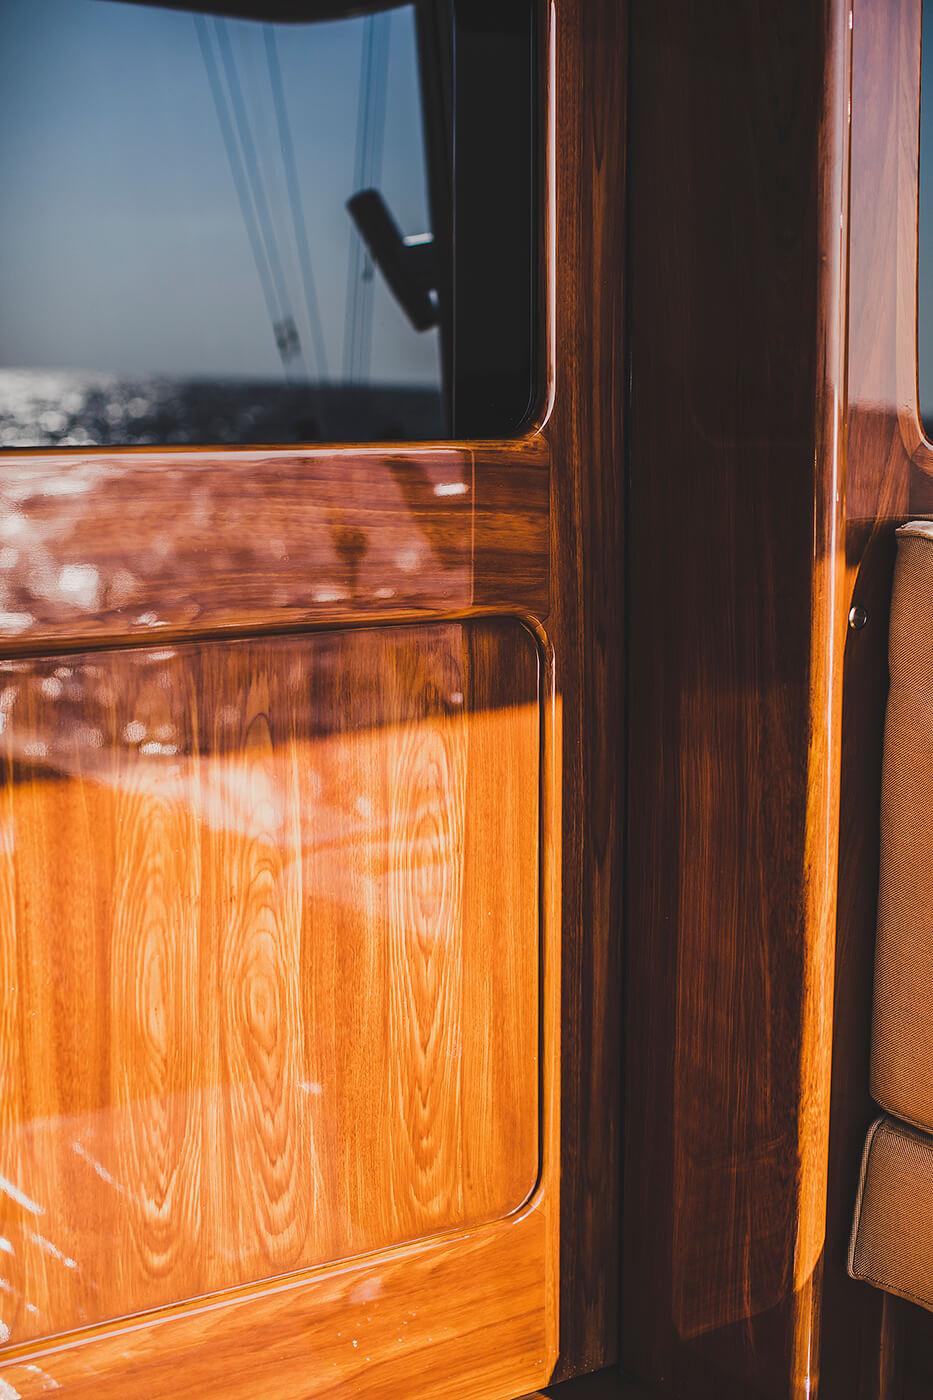 Blue Eagle Houston Texas Faux Teak door and jam wooden grain